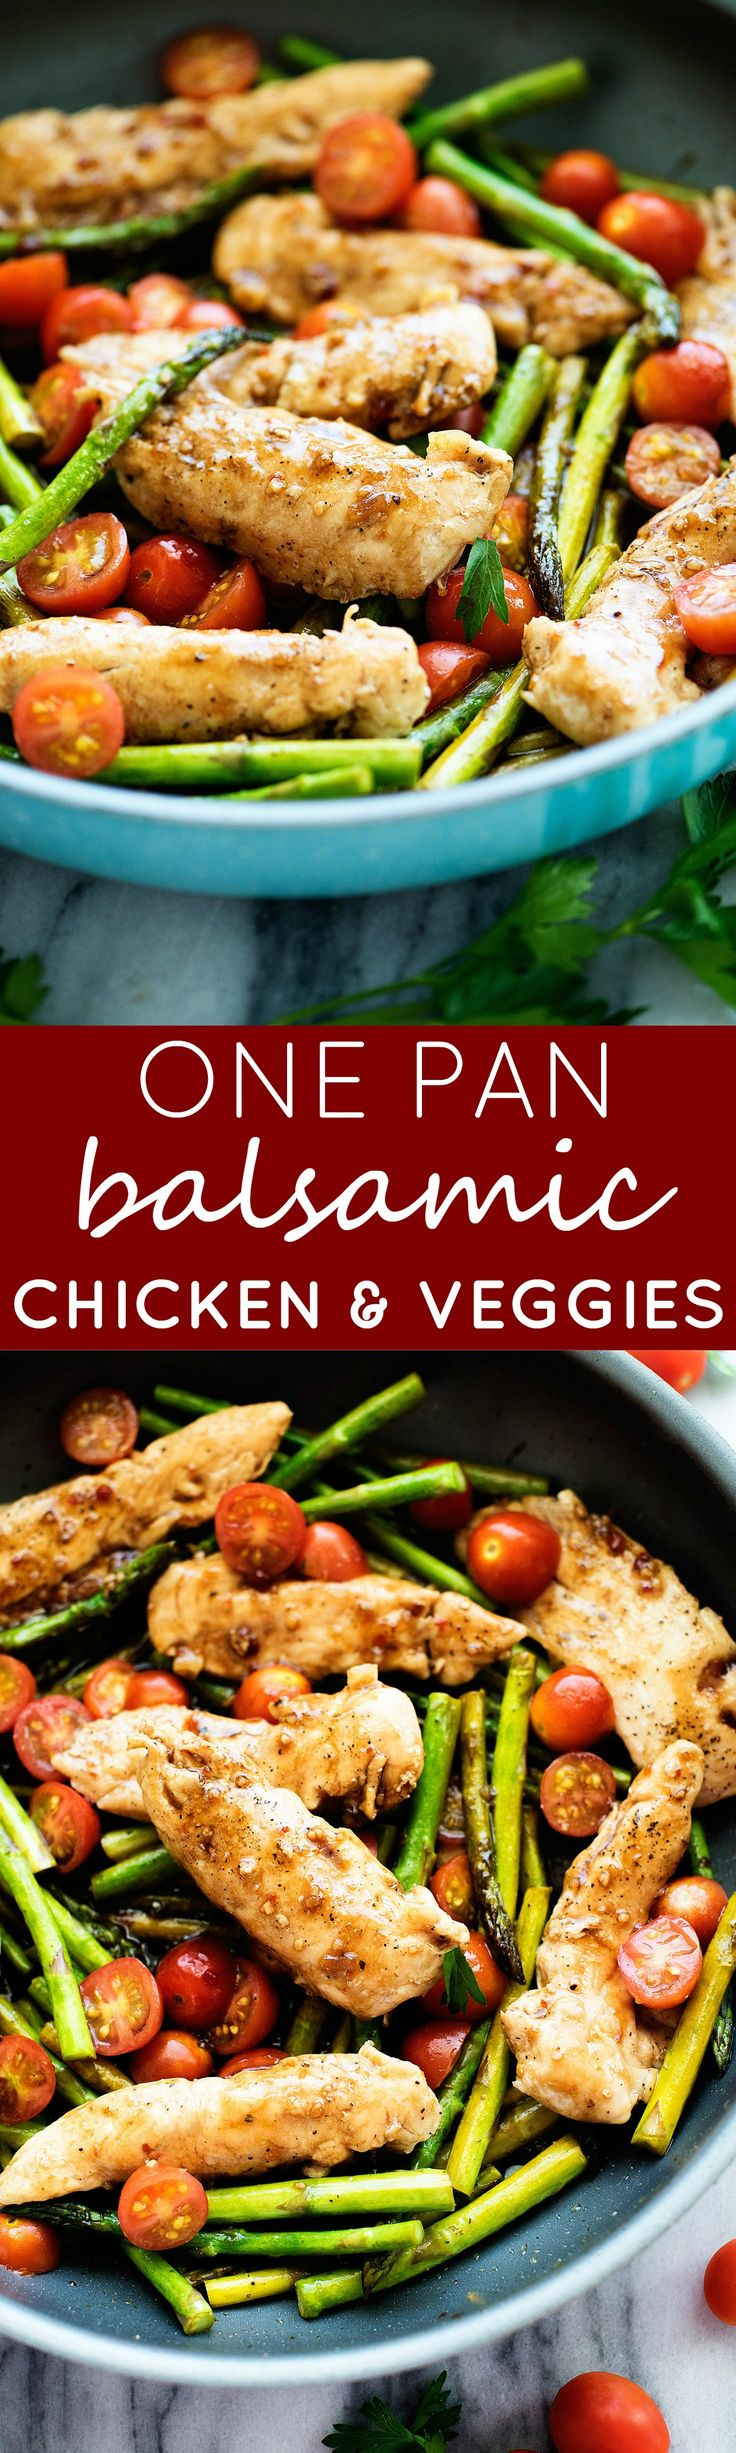 Balsamic vinegar and honey creates a glaze that coats tender chicken &…